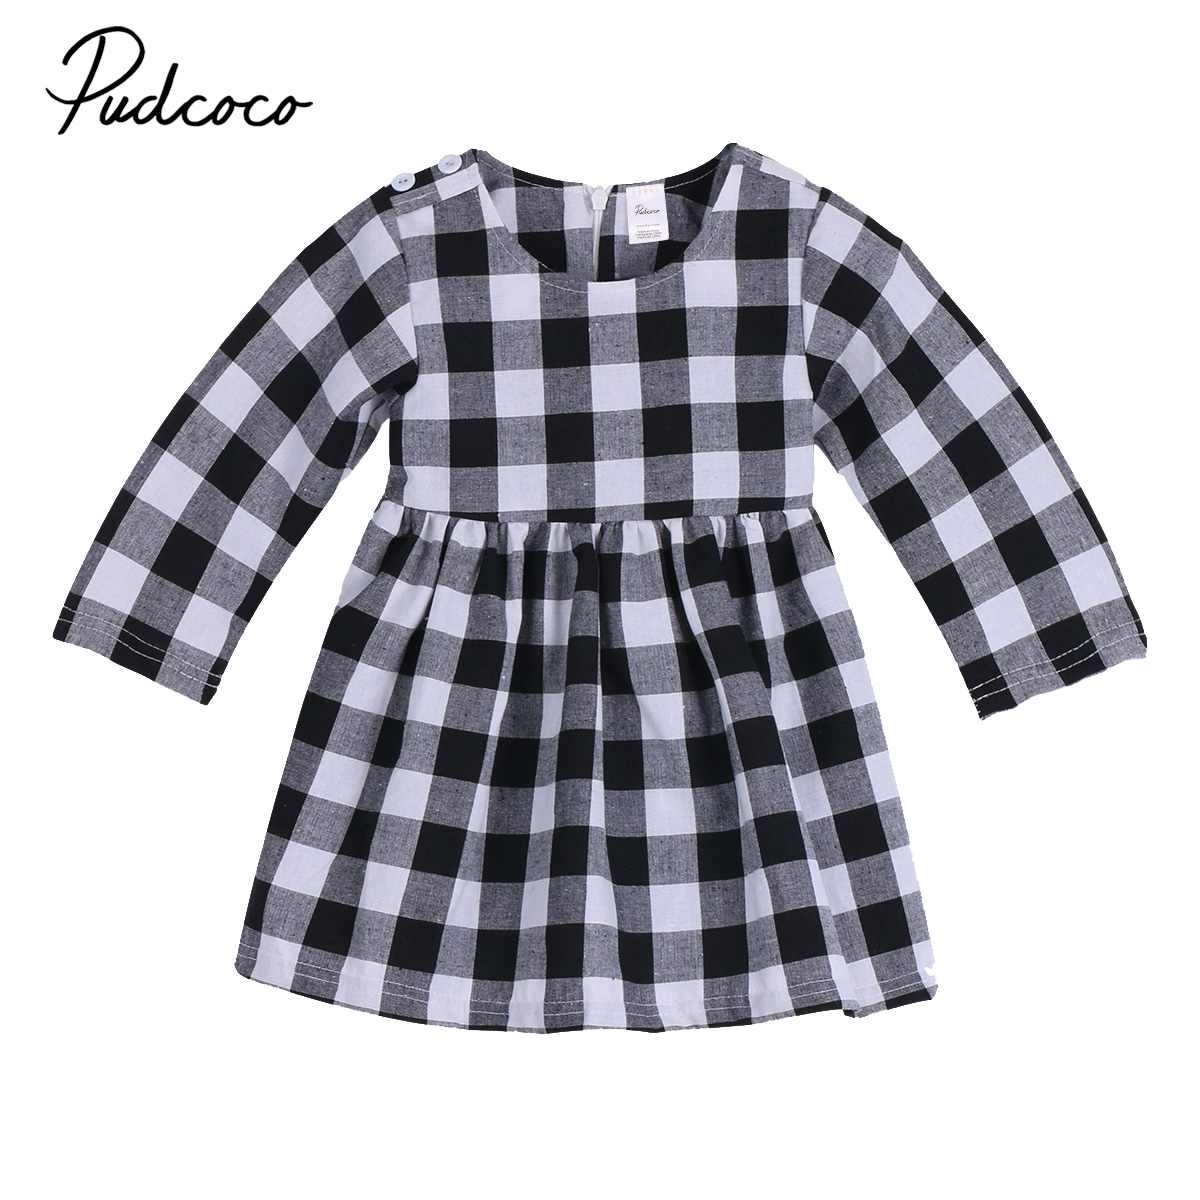 white black plaid cotton baby girl dress long sleeves Newborn Baby Girls Toddler Kids Dress Party Princess Wedding Tutu 0-2T